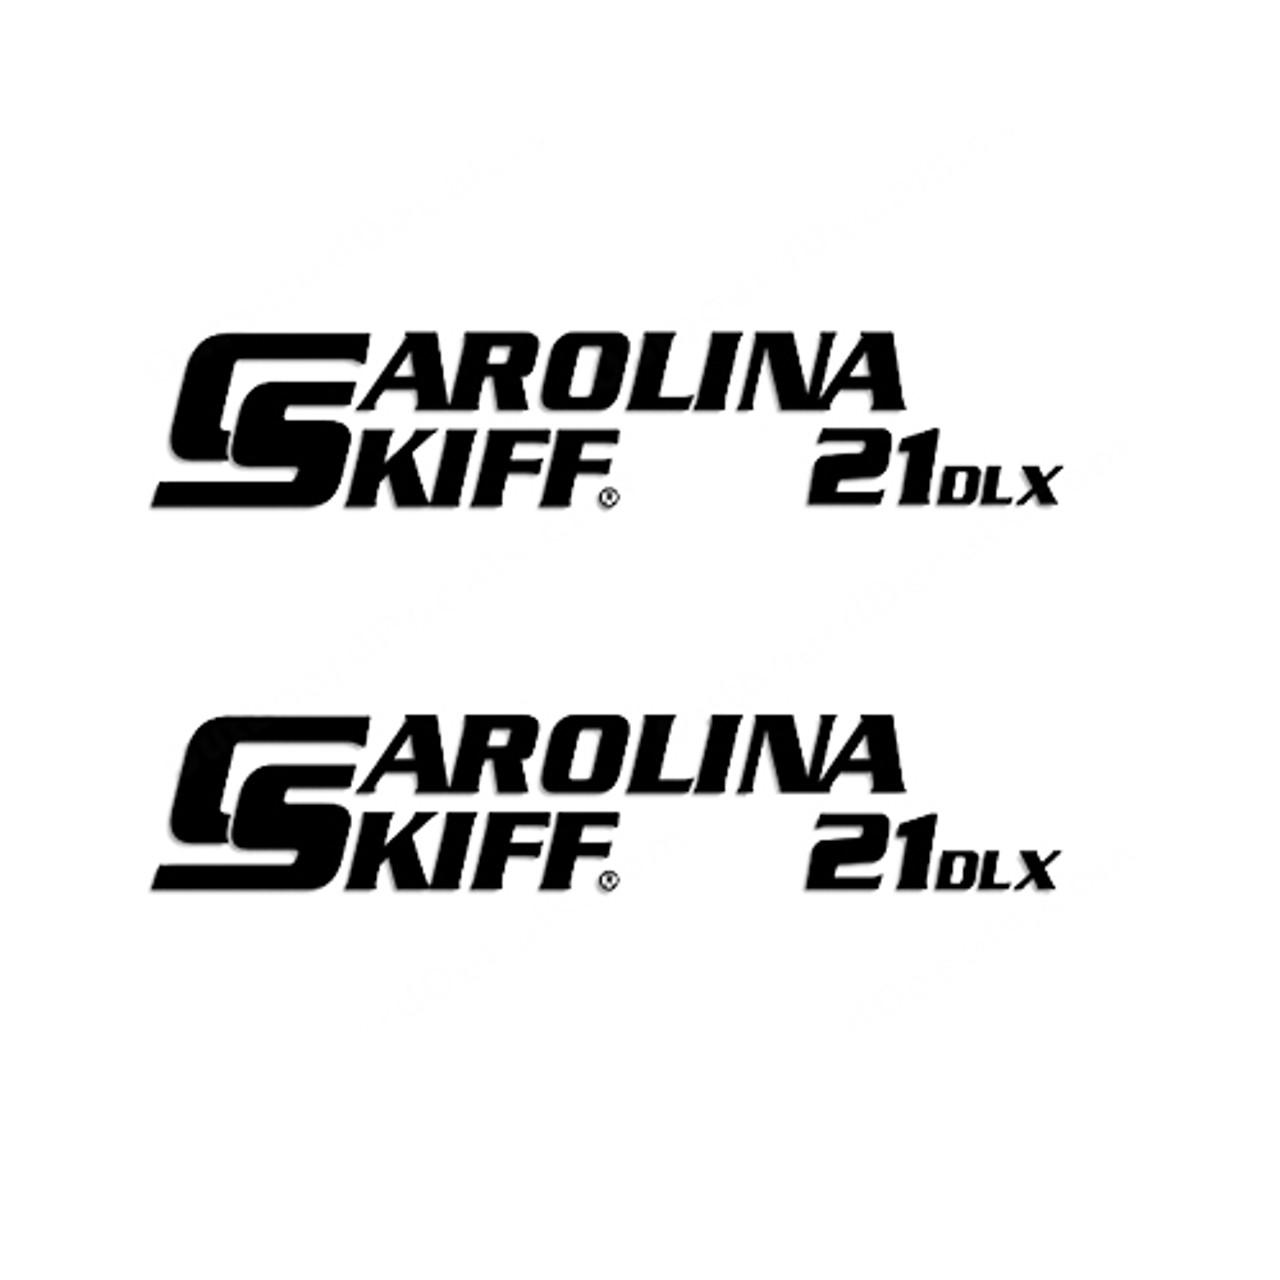 Carolina Skiff 21 Dlx Boat Vinyl Decal Kit